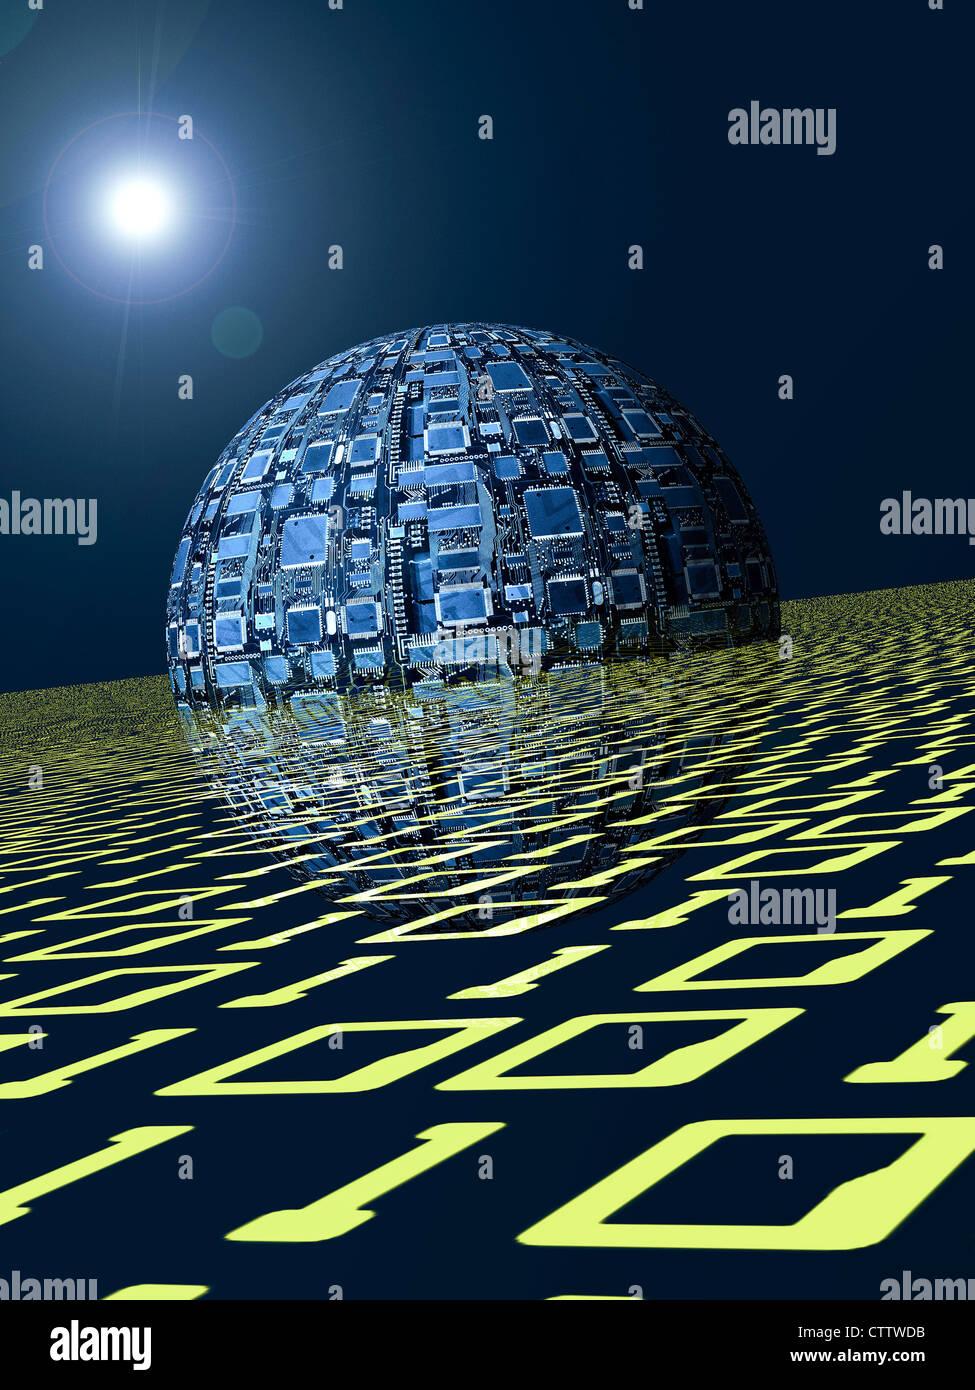 Kugel aus Computerchips in Einer Ebene aus Binären objekthaften Stockbild